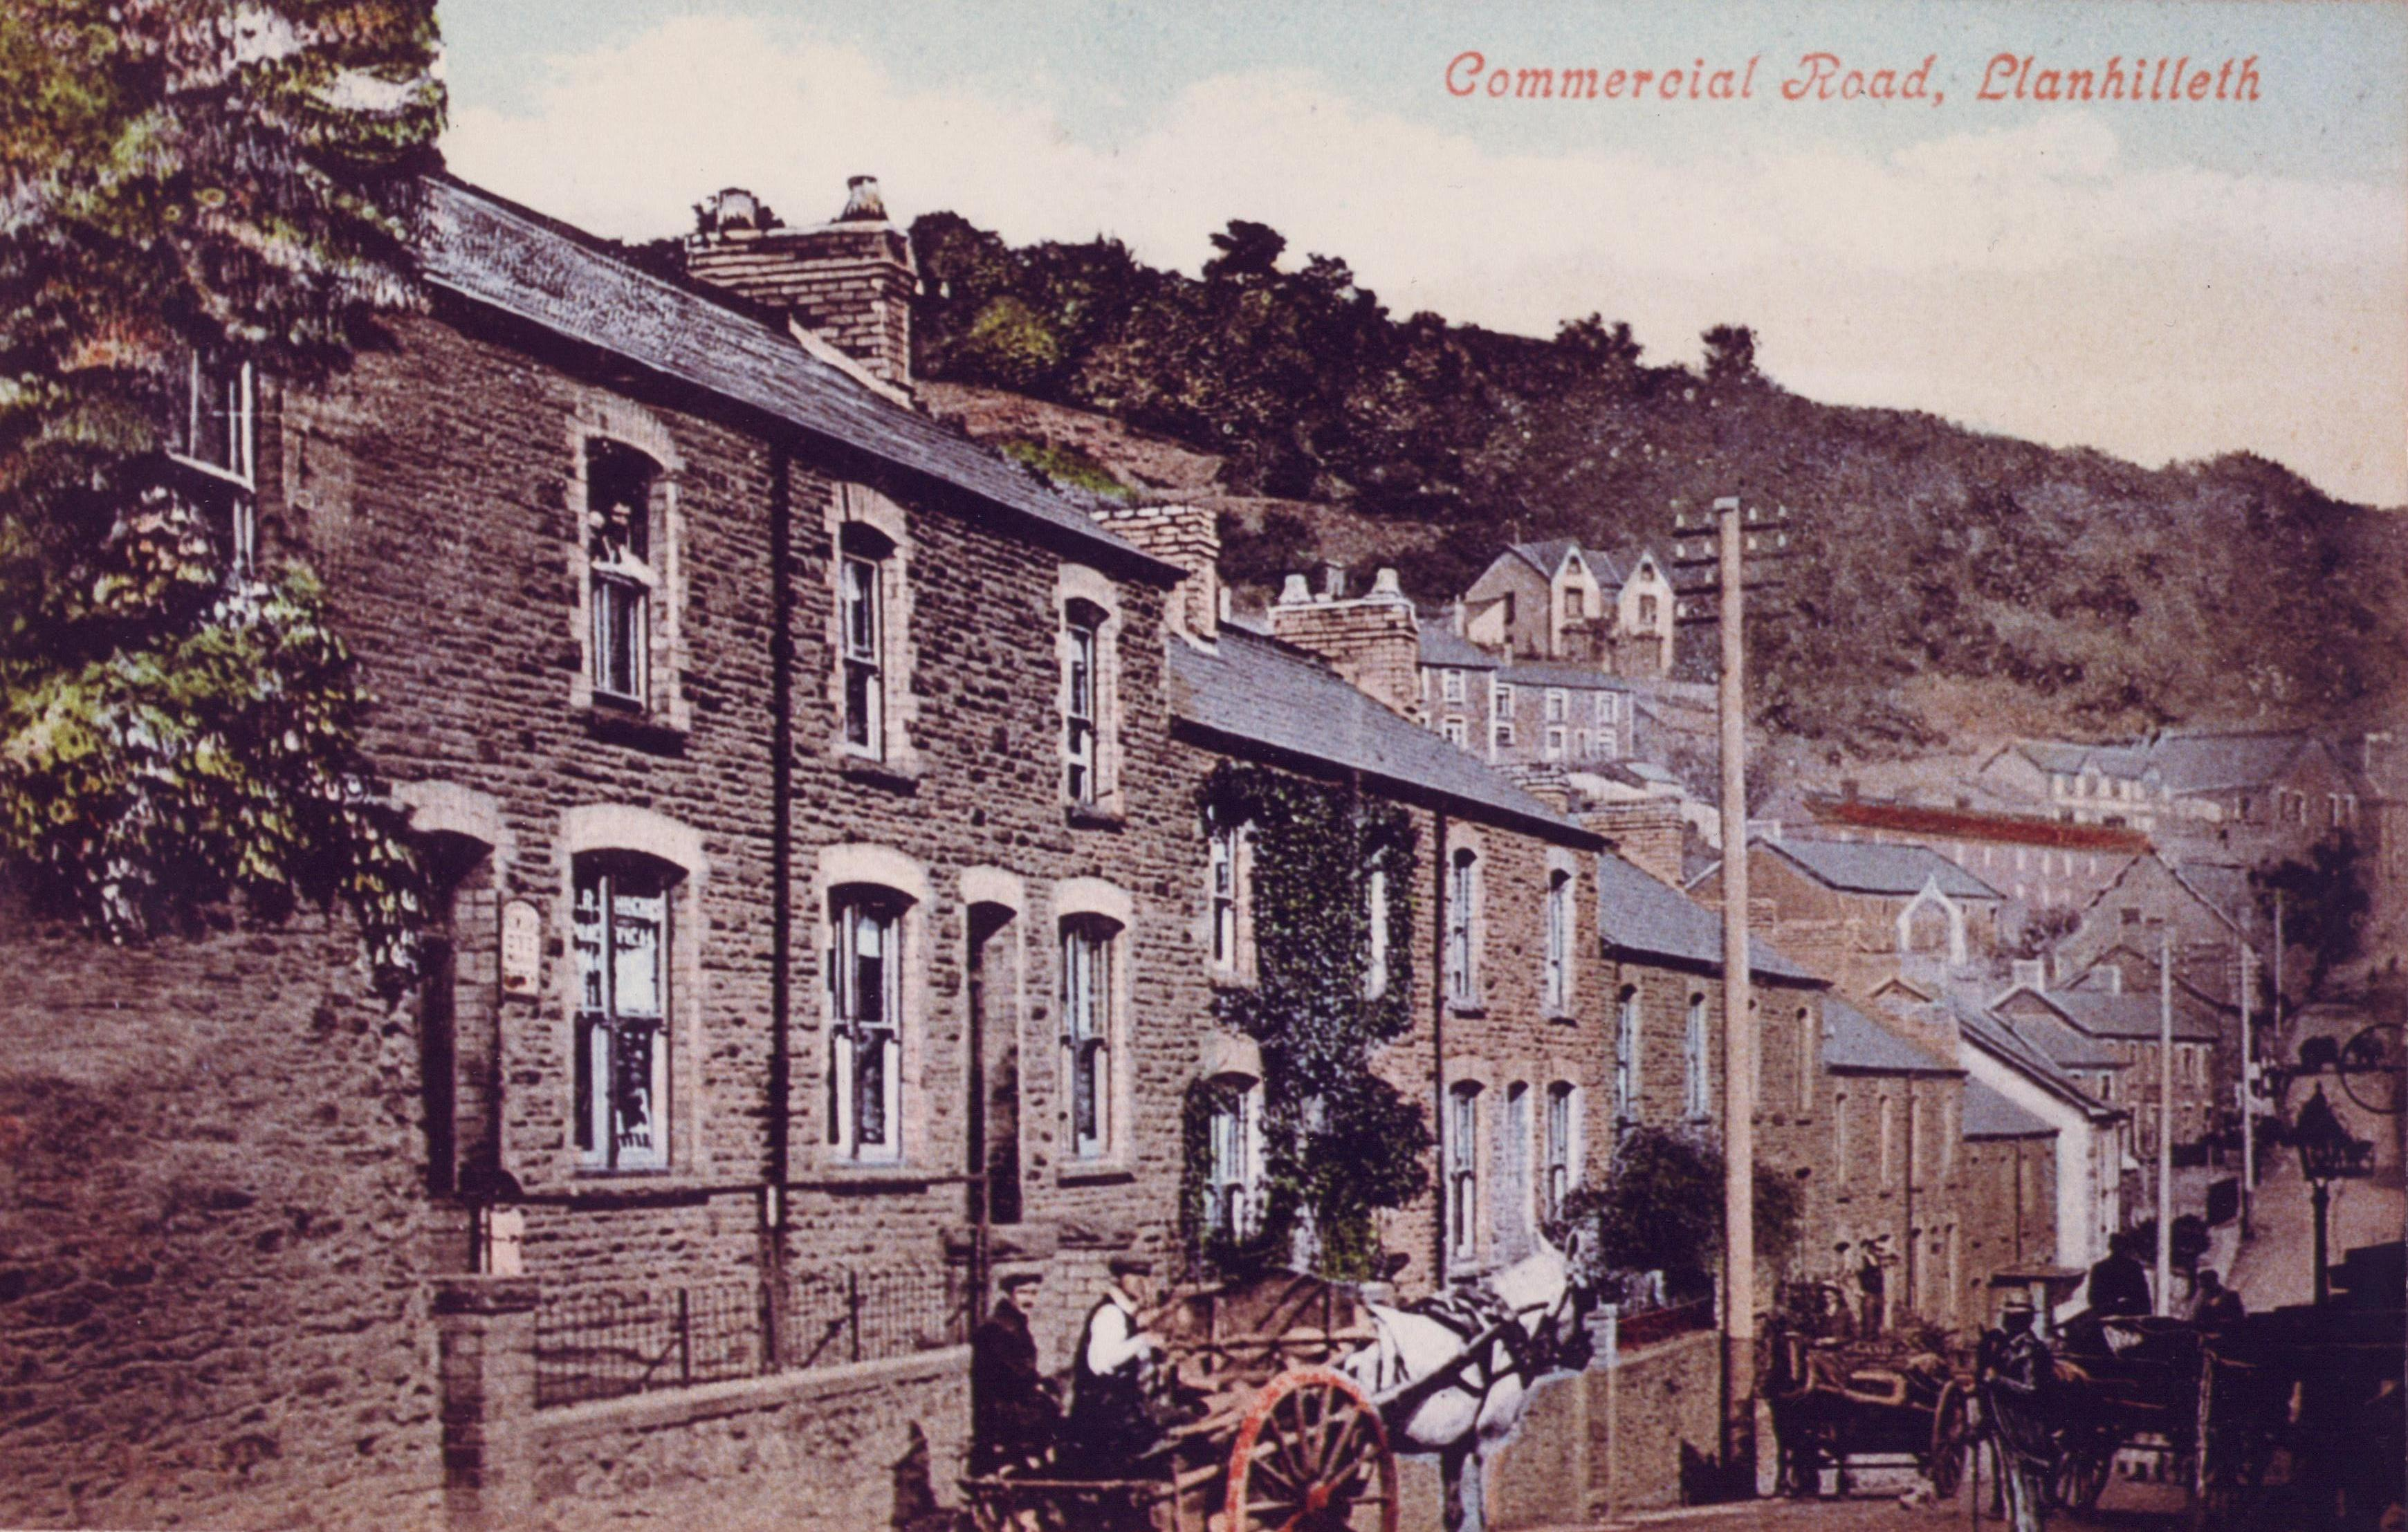 Commerical Road, Llanhilleth 2